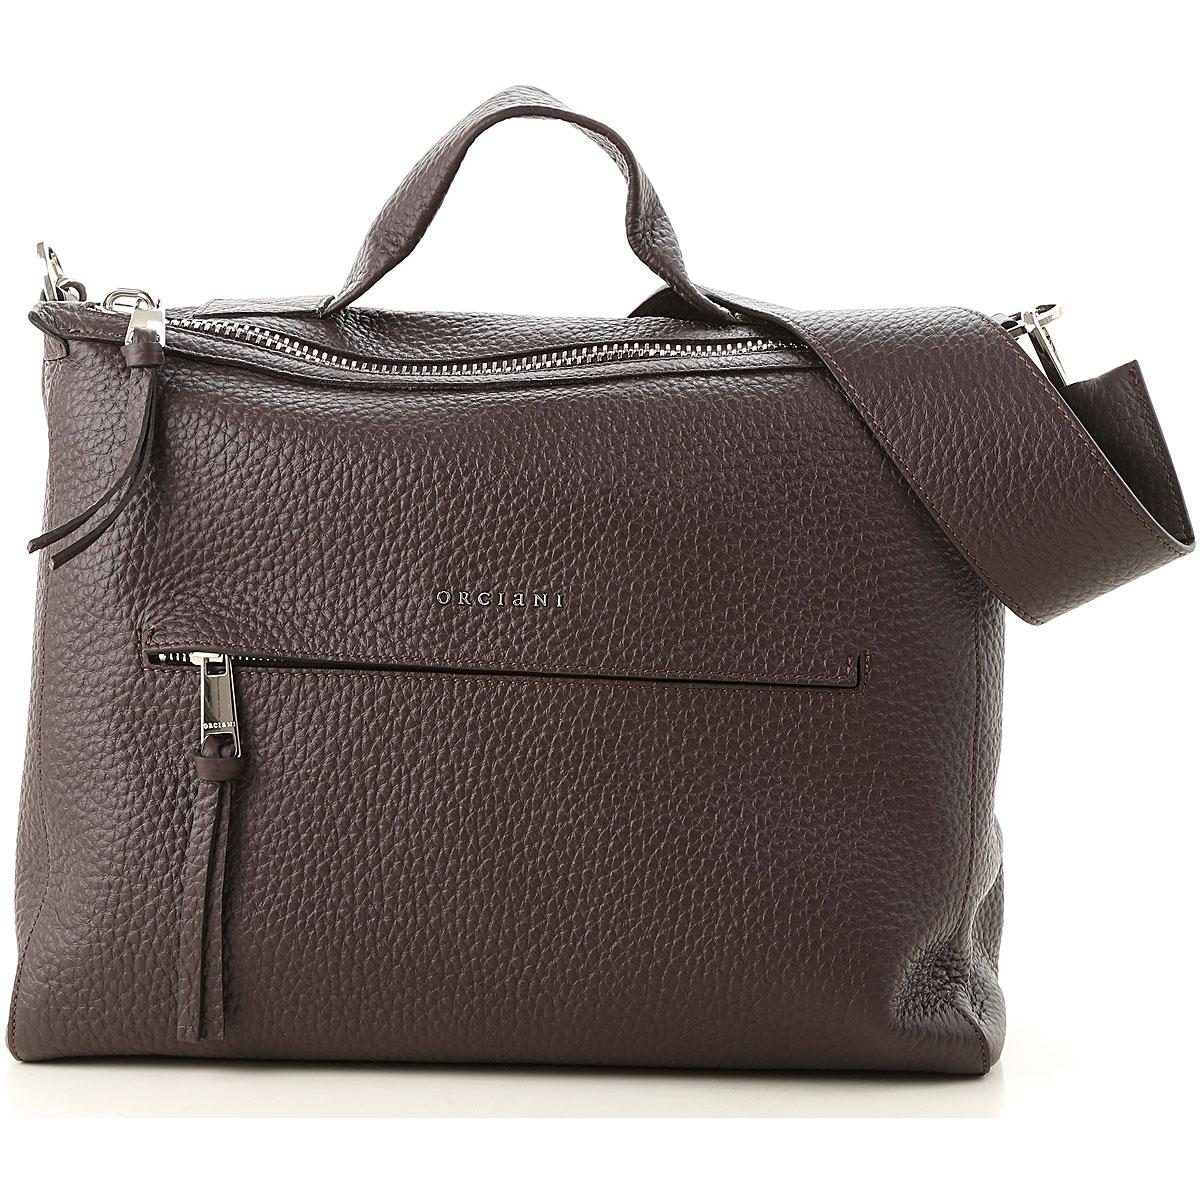 Orciani Top Handle Handbag On Sale, Dark Bordeaux, Leather, 2019